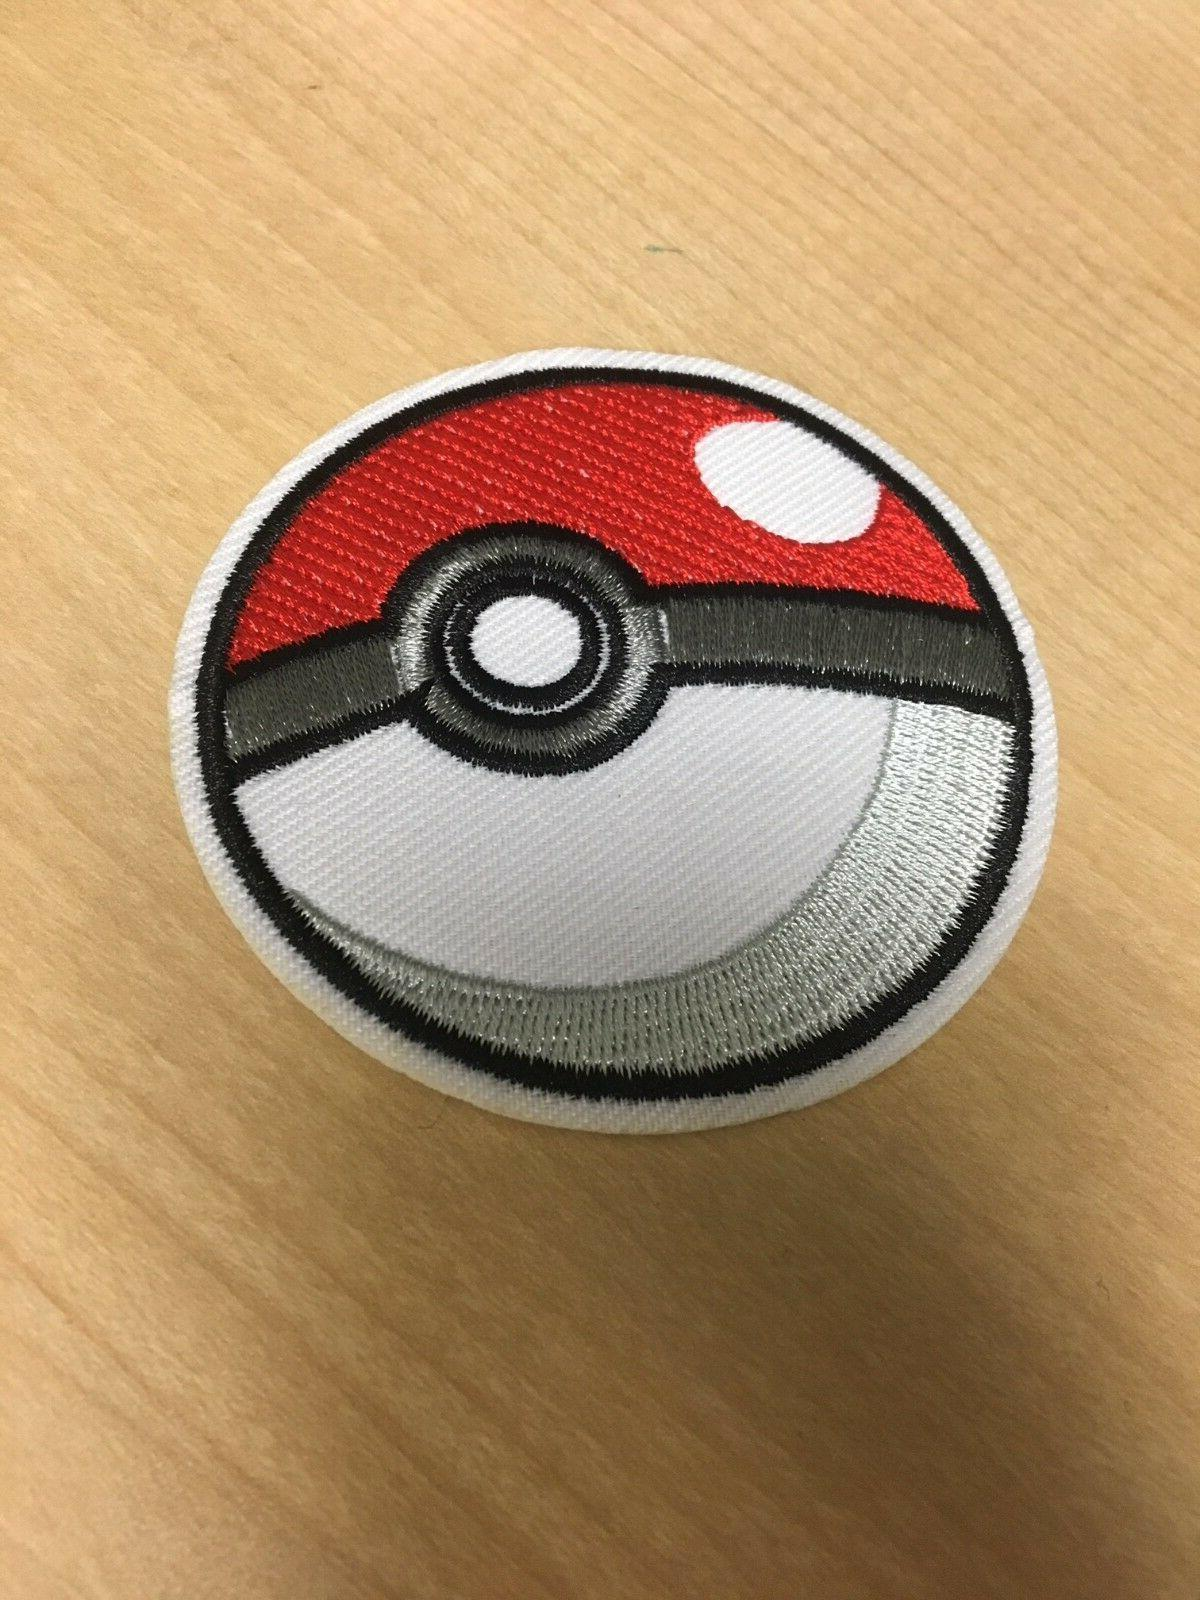 pokemon pokeball embroidered iron sew on patch